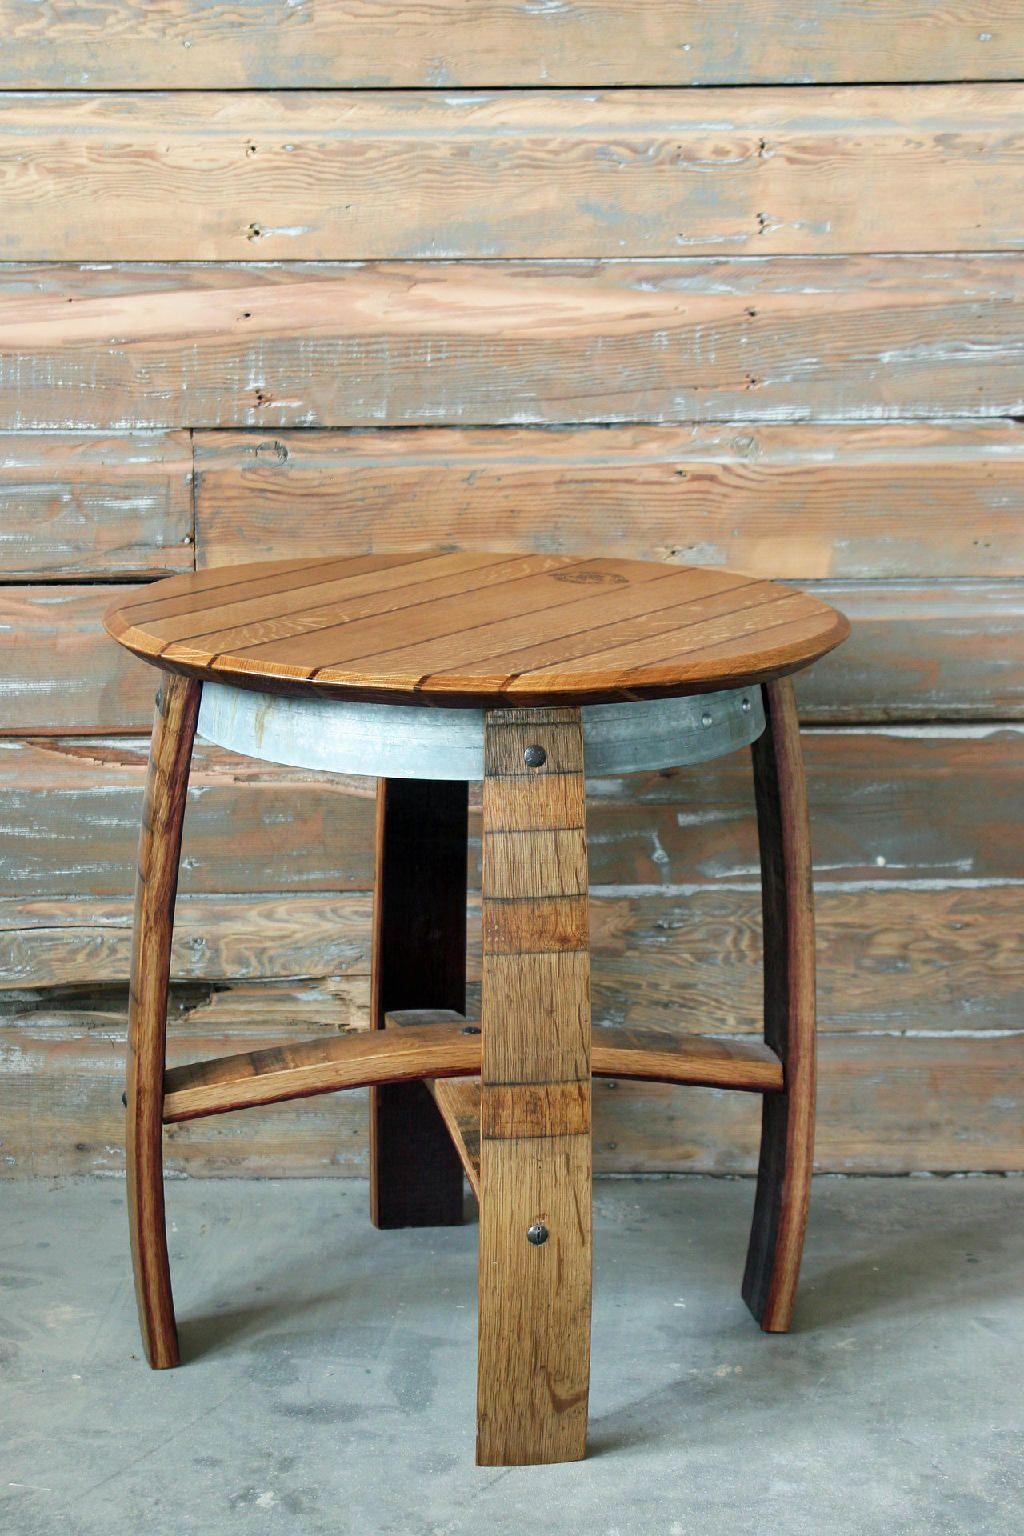 used wine barrel furniture. gorgeous furniture made out of used wine barrels barrel